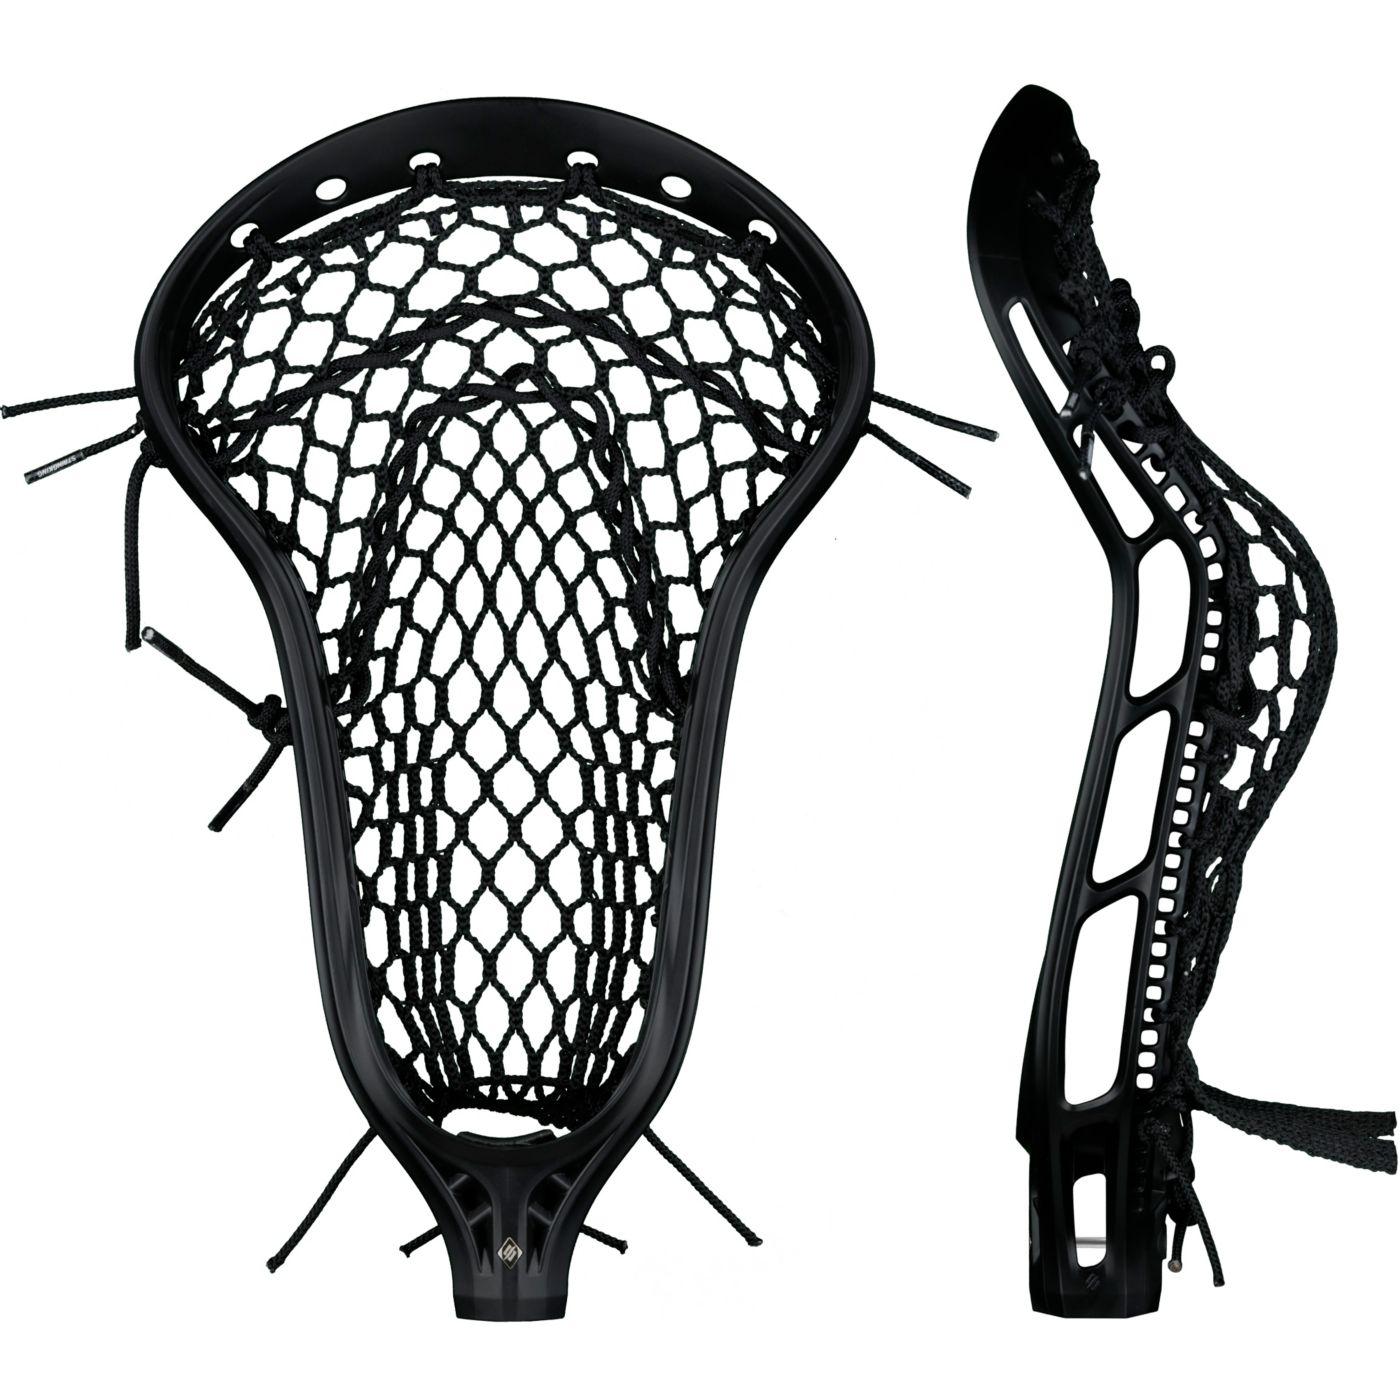 StringKing Women's Mark 2 H4 Defensive M4 Strung Lacrosse Head